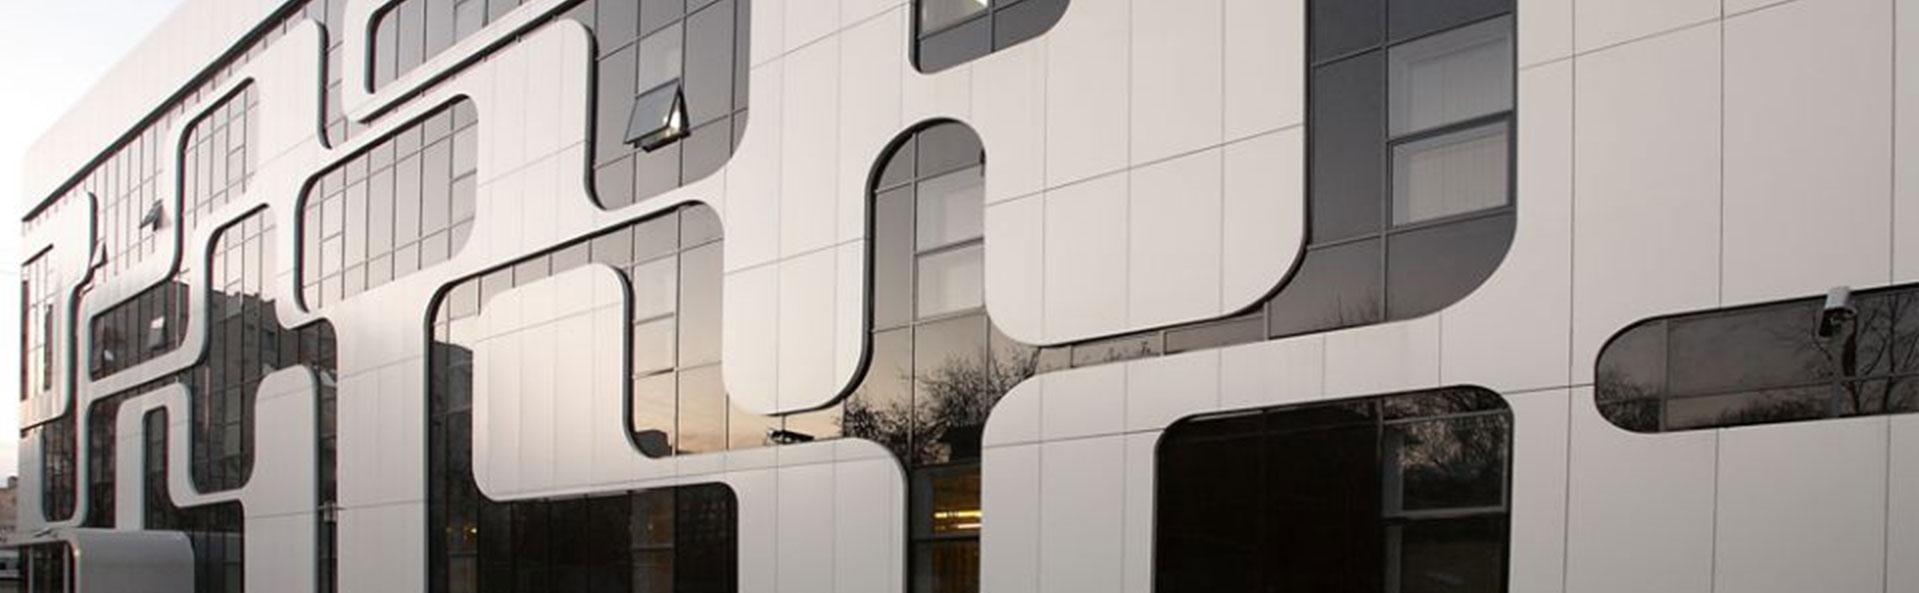 http://awdi.nyc/aluminium-composite-panels